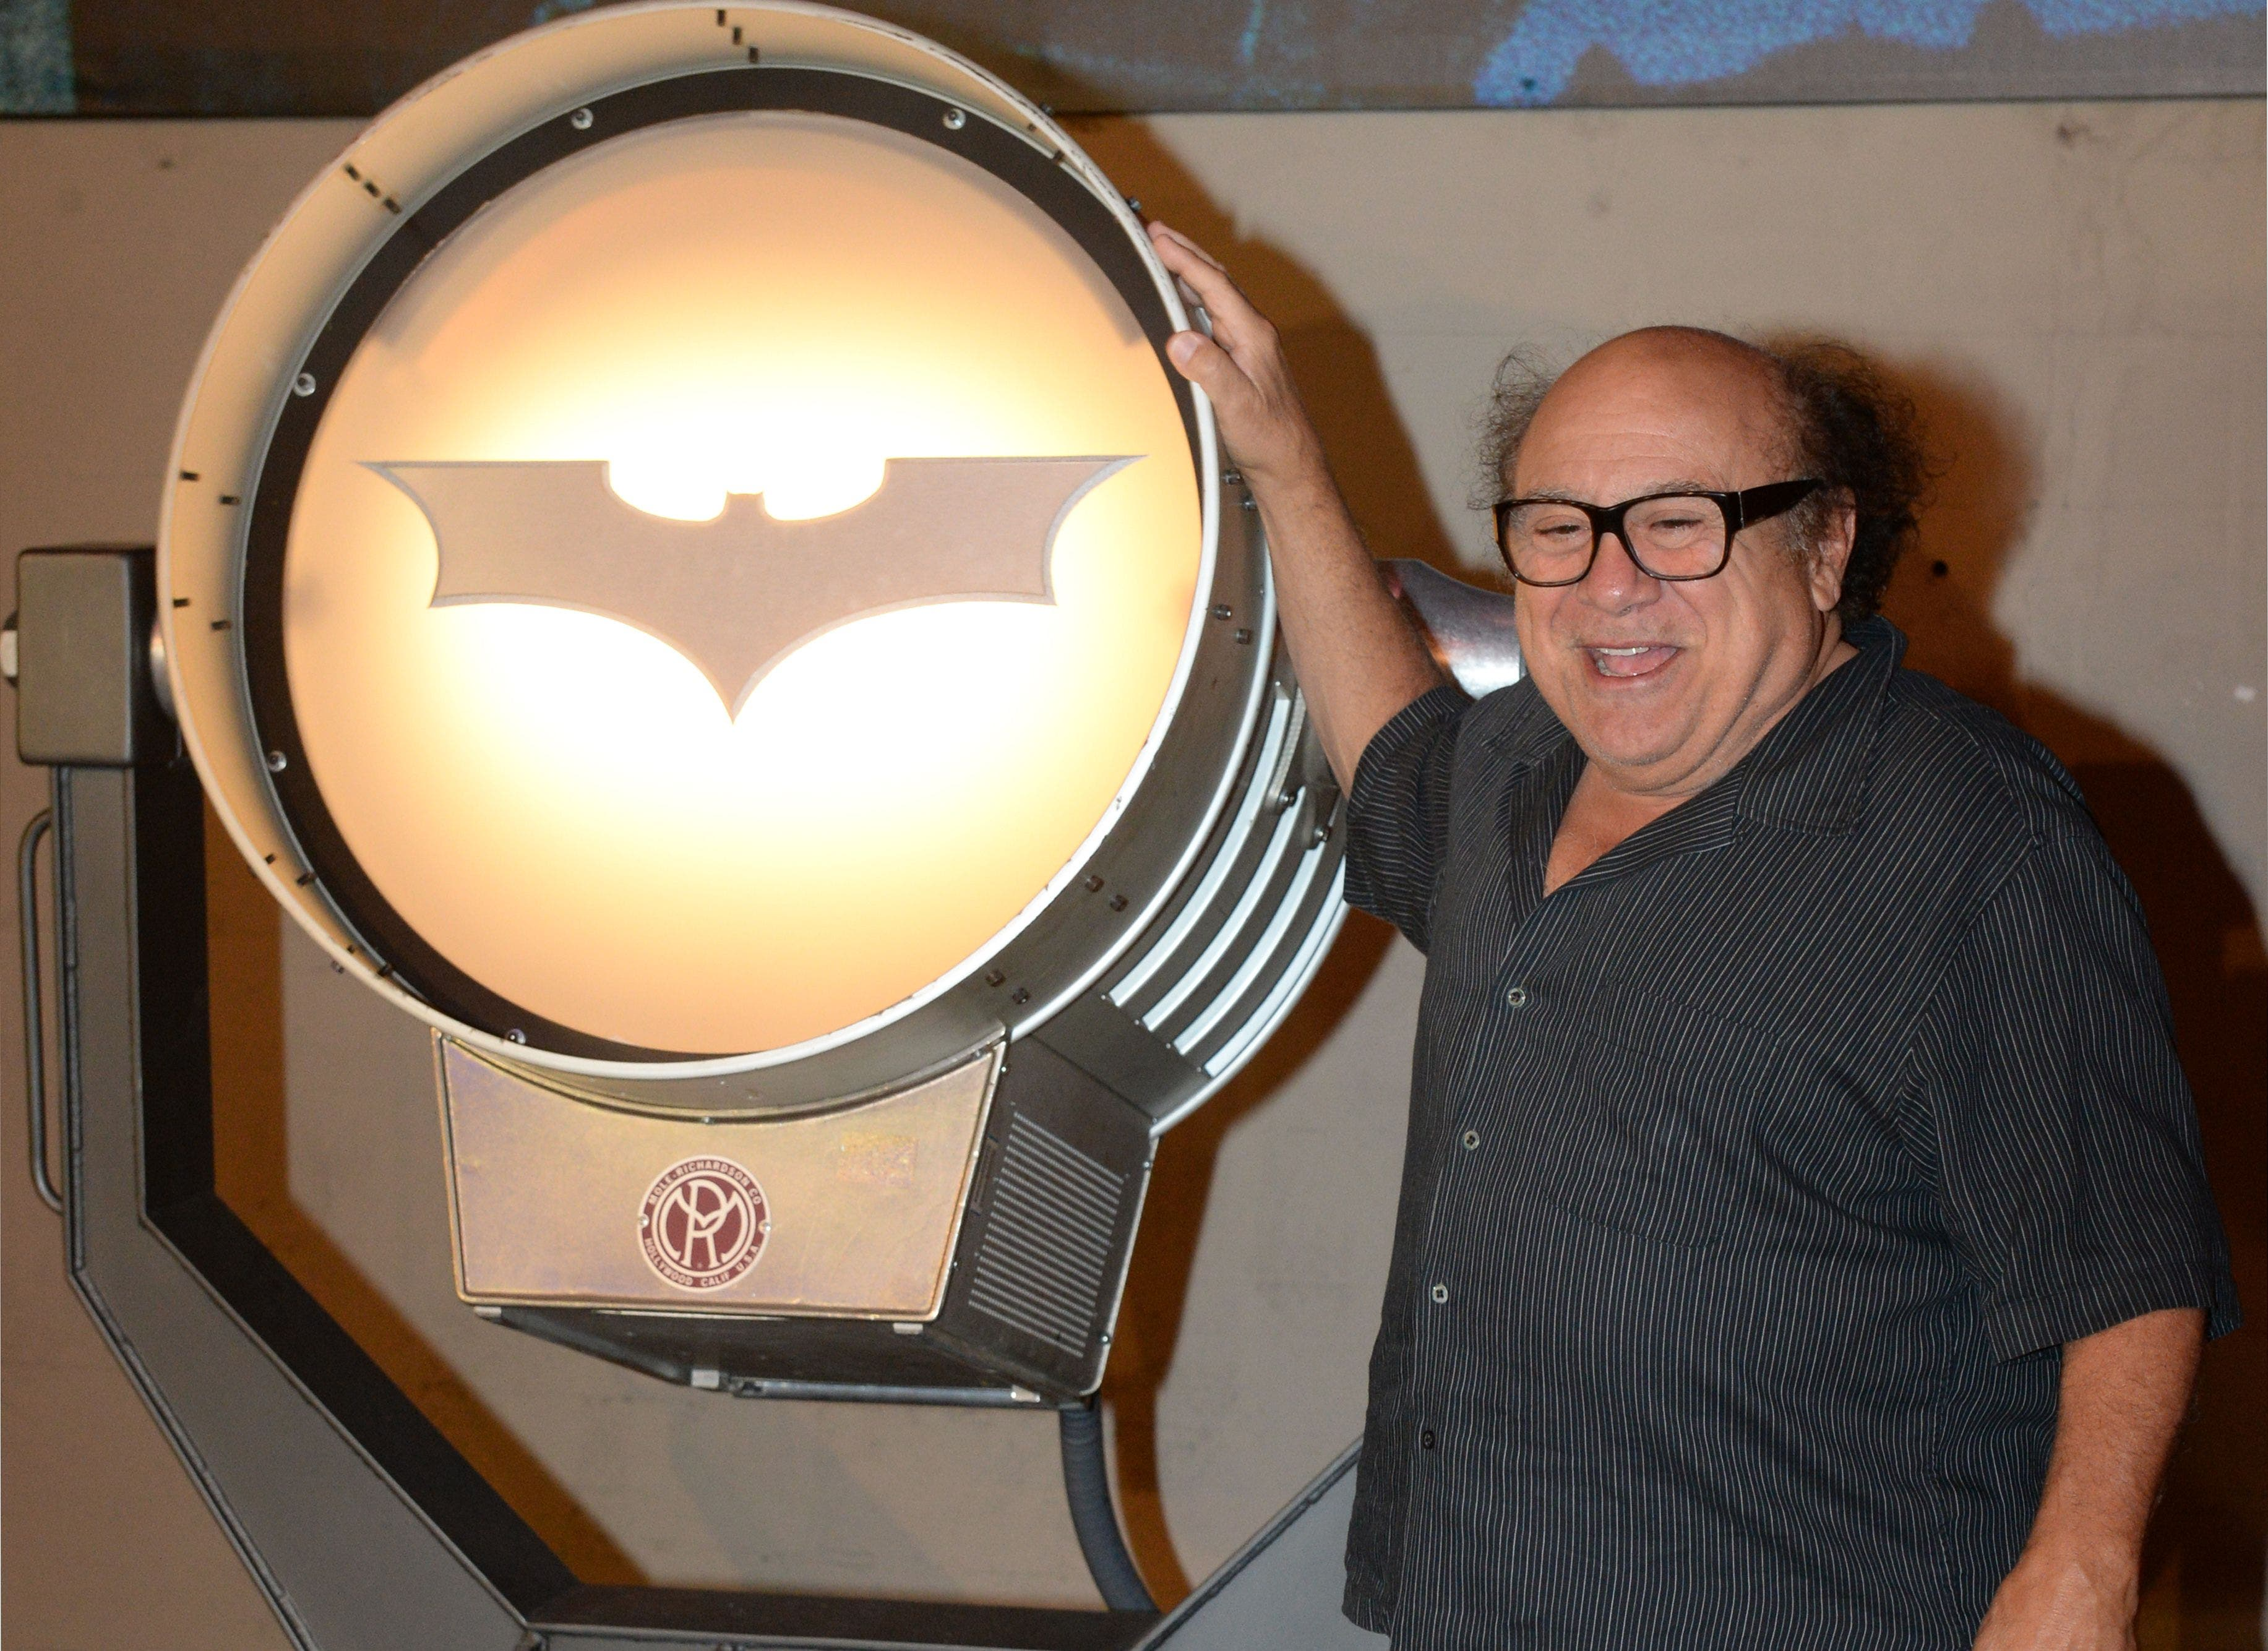 Batman exhibit AFP Dani DeVito